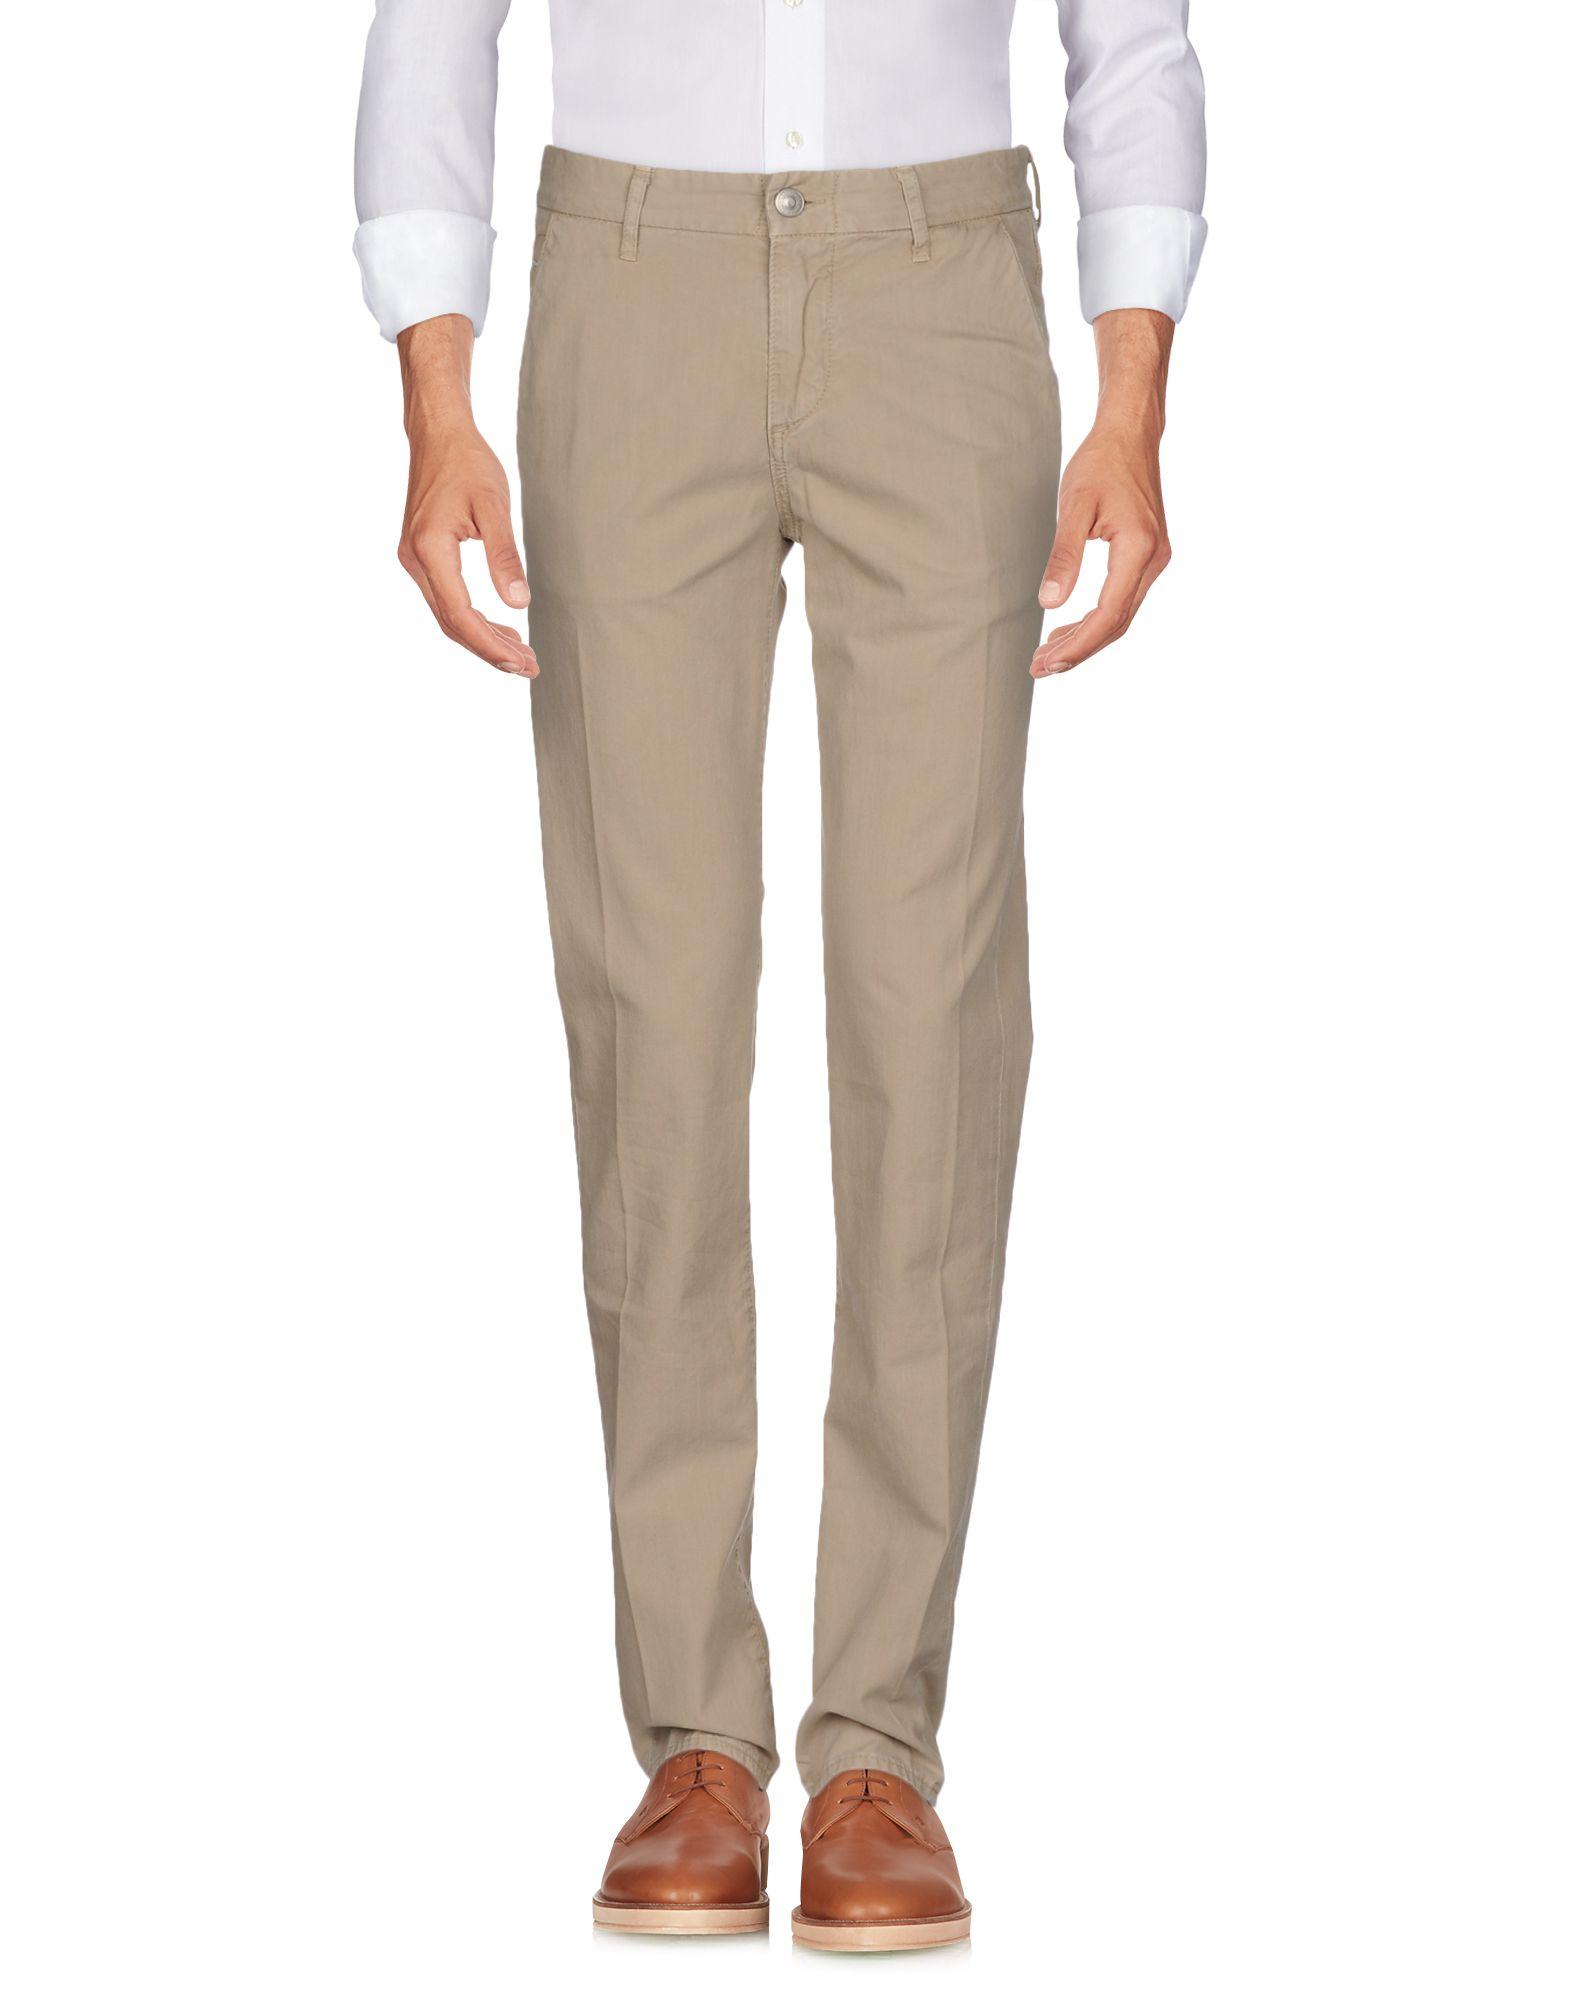 CARE LABEL Повседневные брюки 19 70 genuine wear повседневные брюки